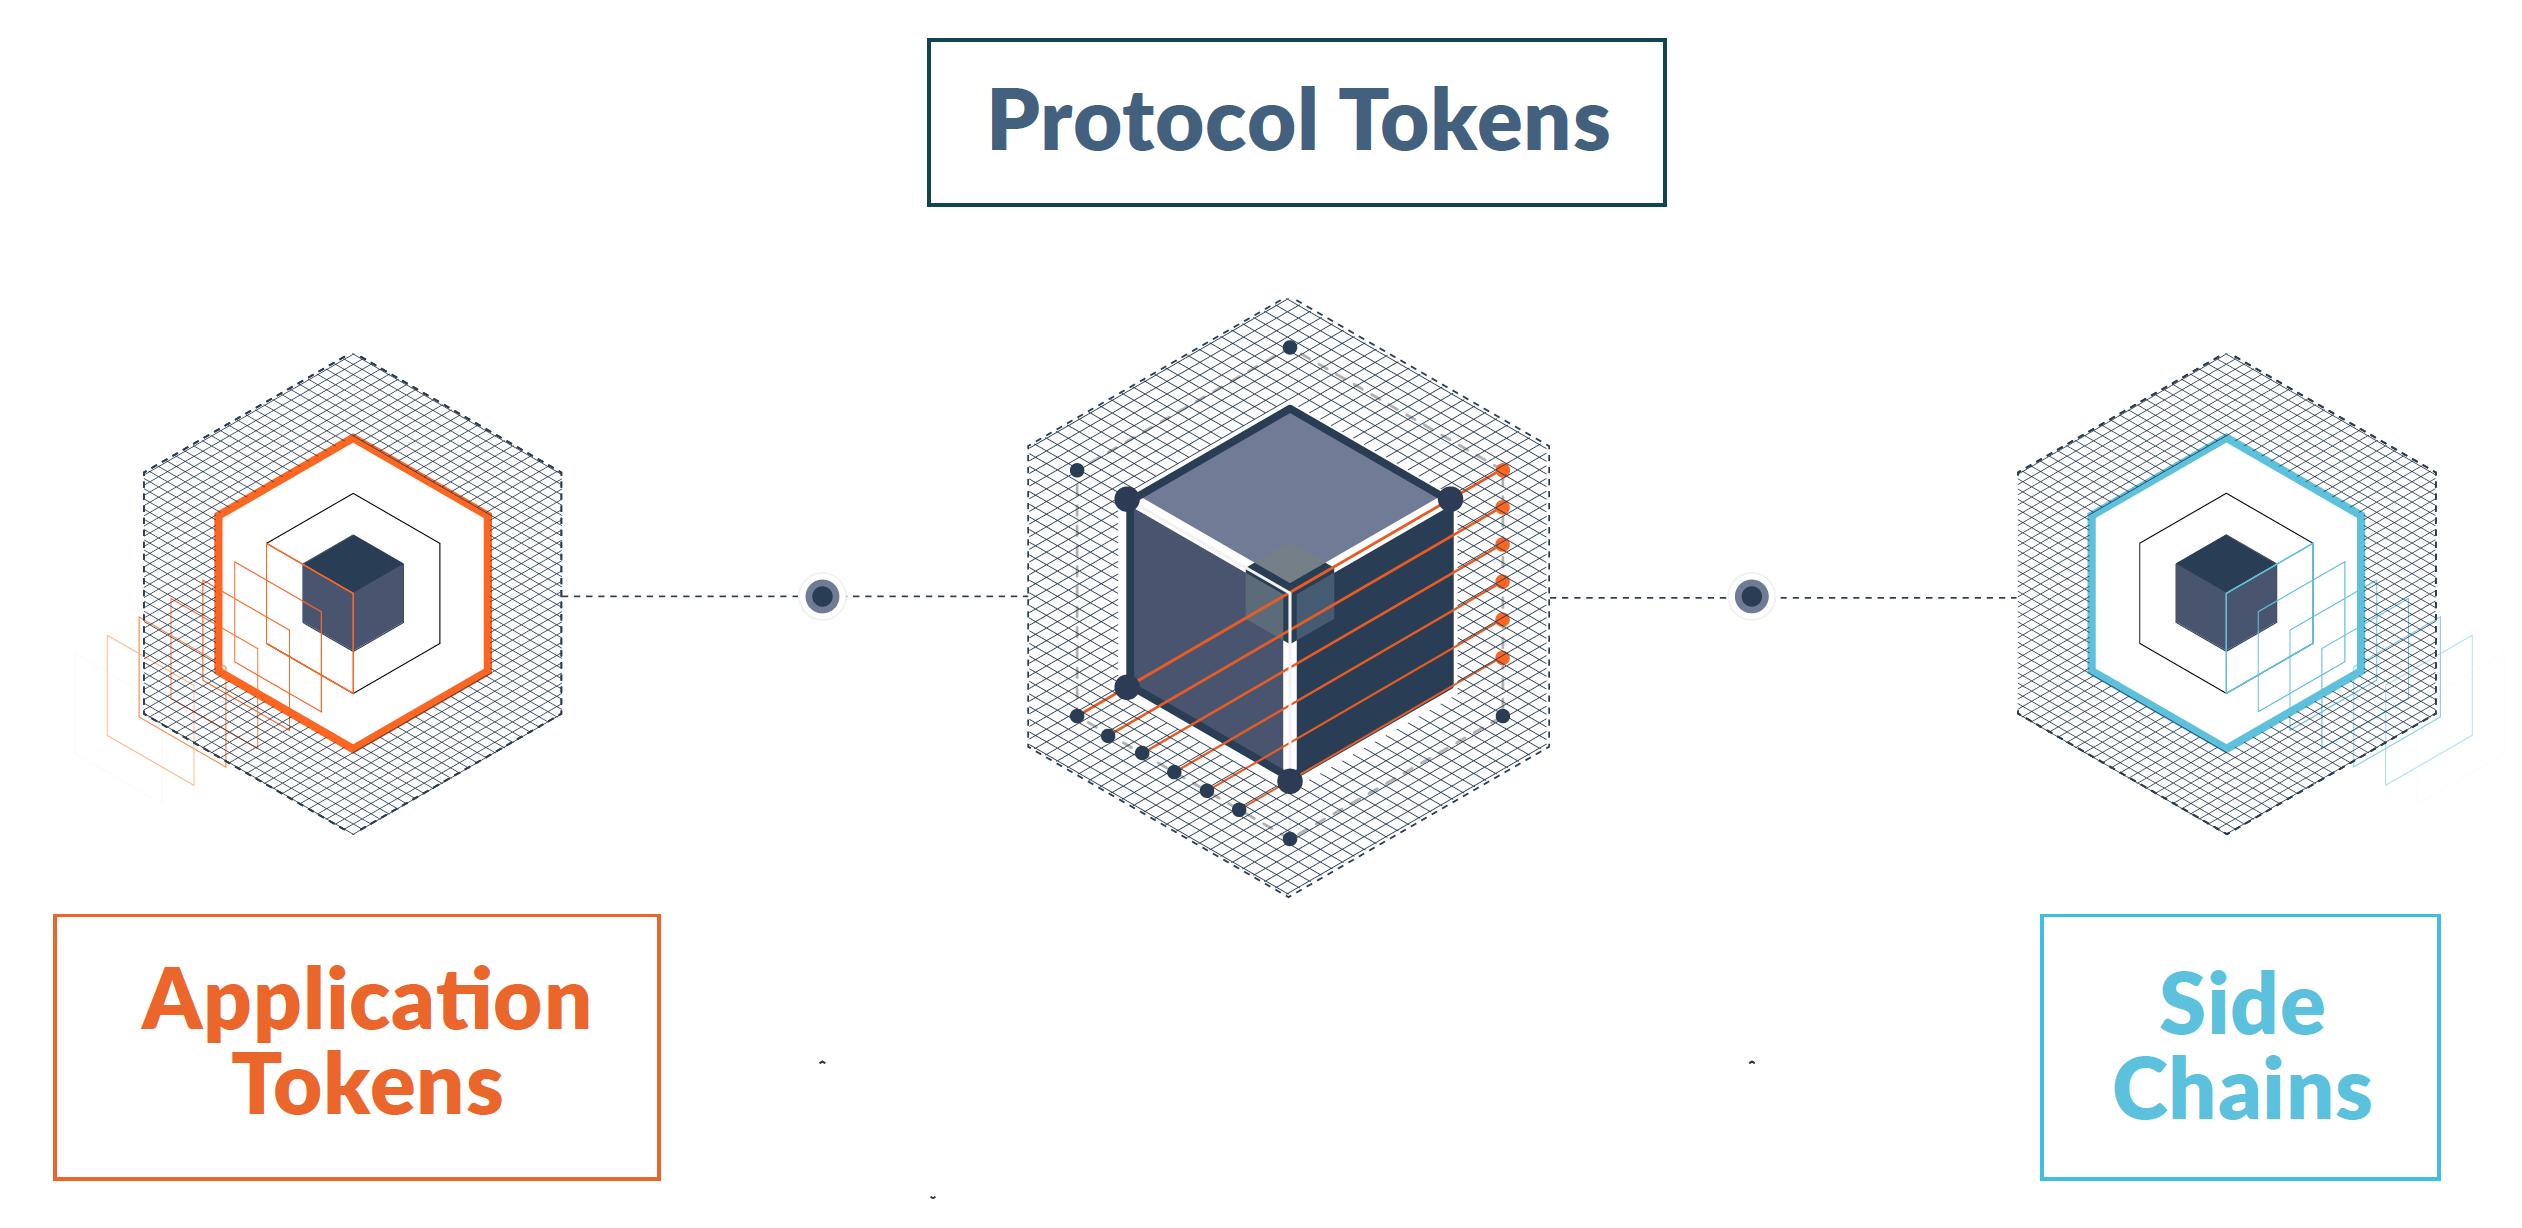 Protocol Tokens Illustration